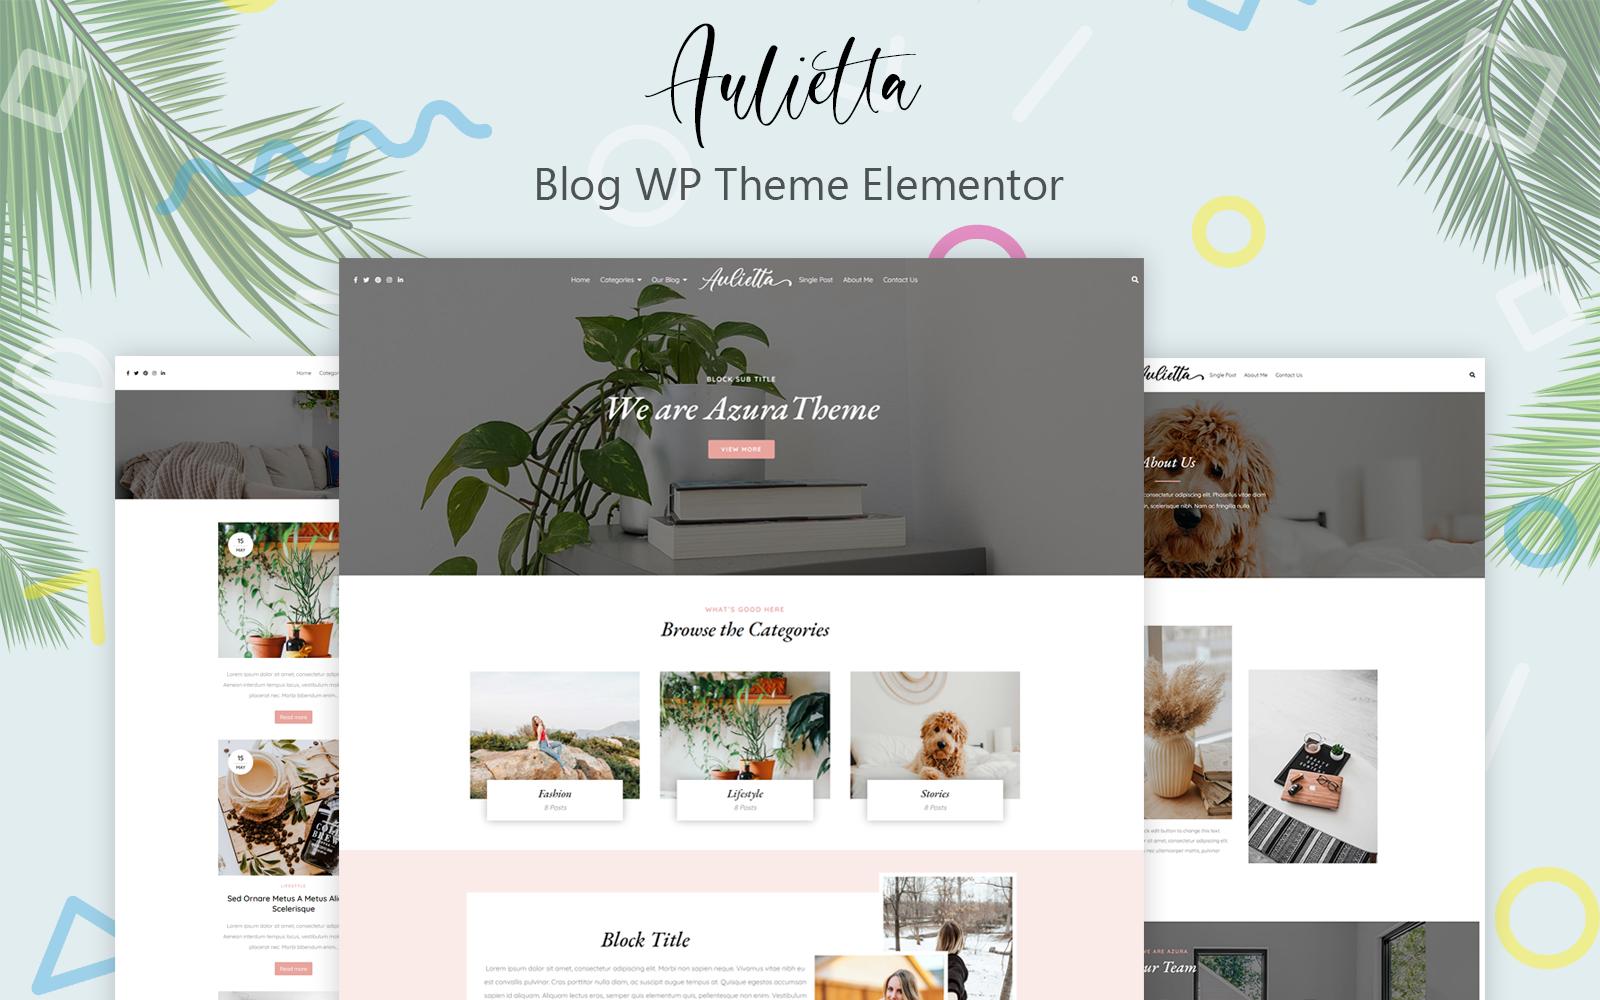 Aulietta - Blog WP Theme Elementor